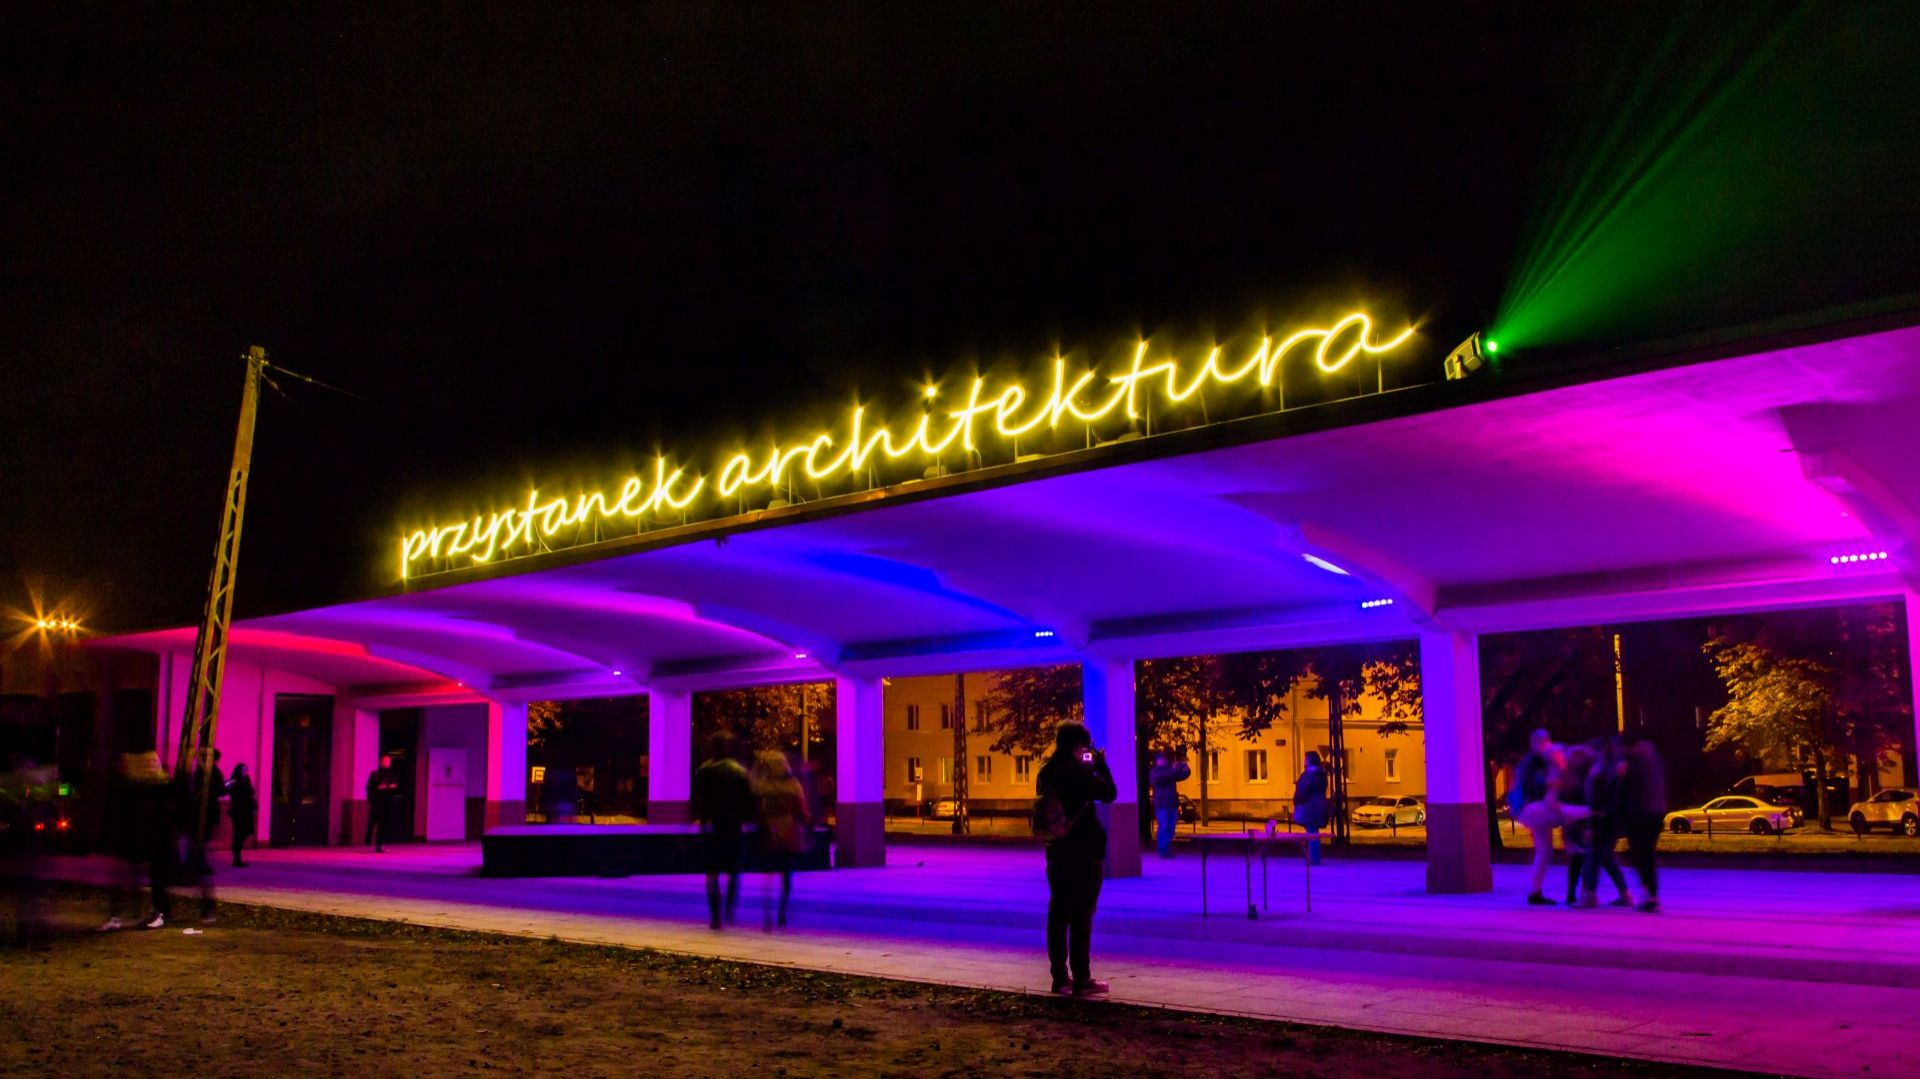 Przystanek Architektura_mat. Bright Lights_fot. Jan Grzesik (24).jpg